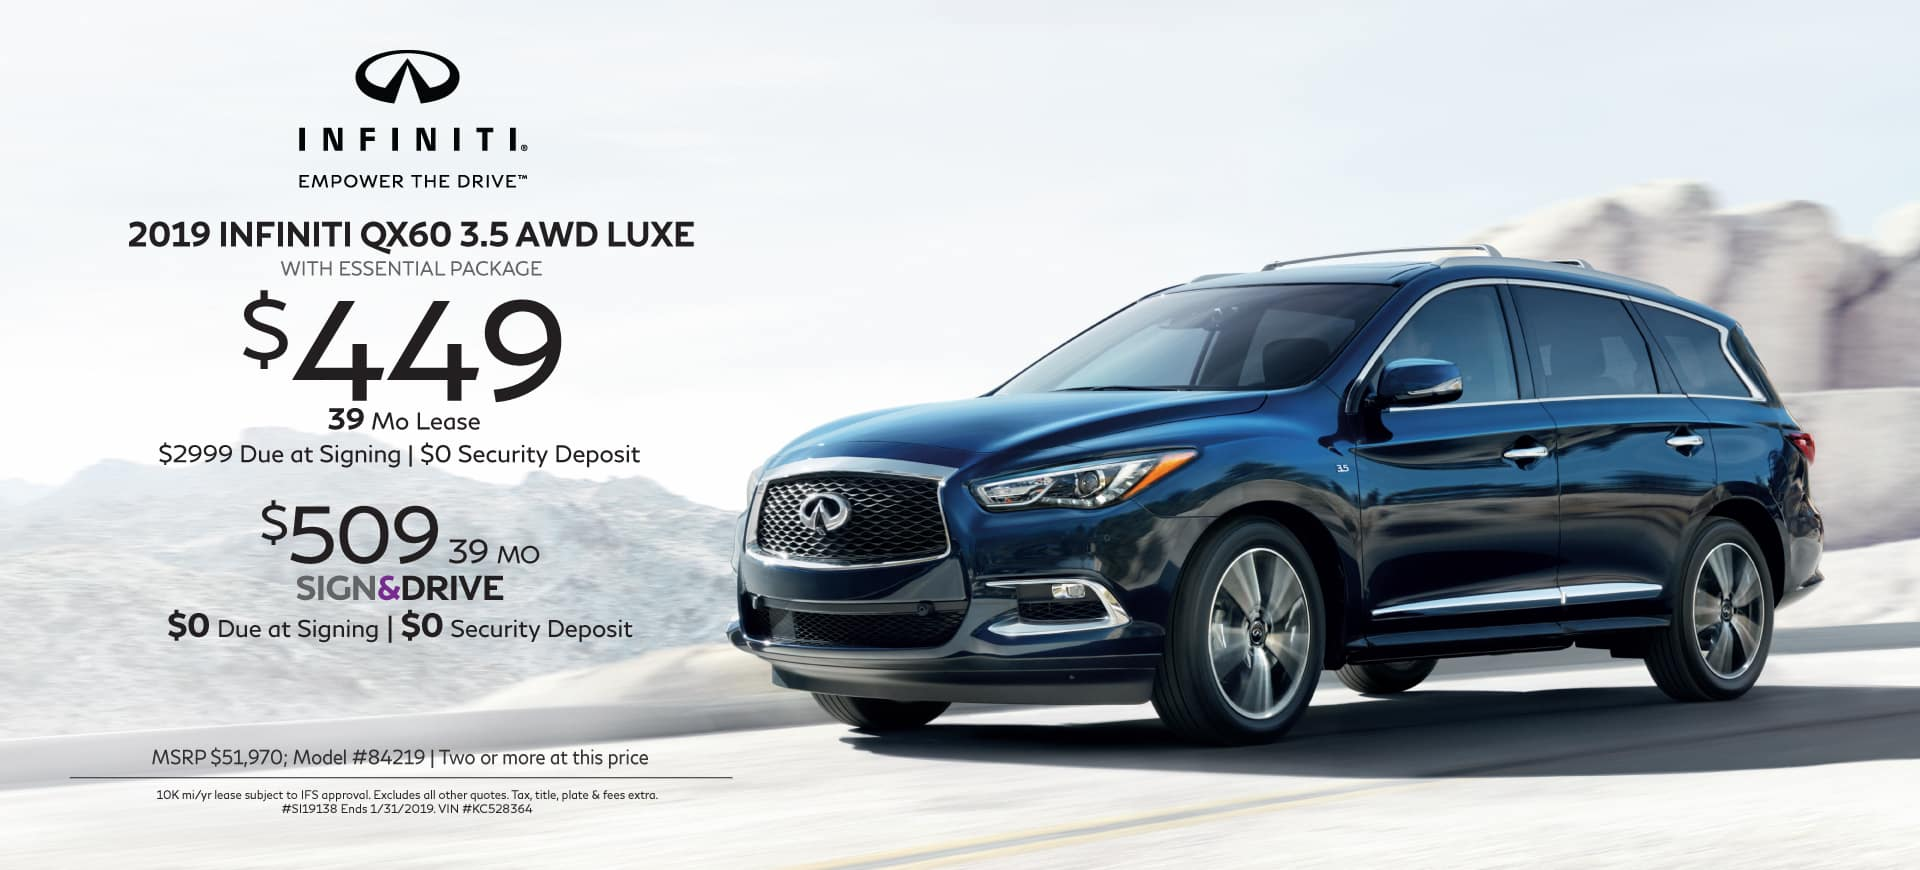 2019 INFINITI Specials QX60 3.5 AWD LUXE